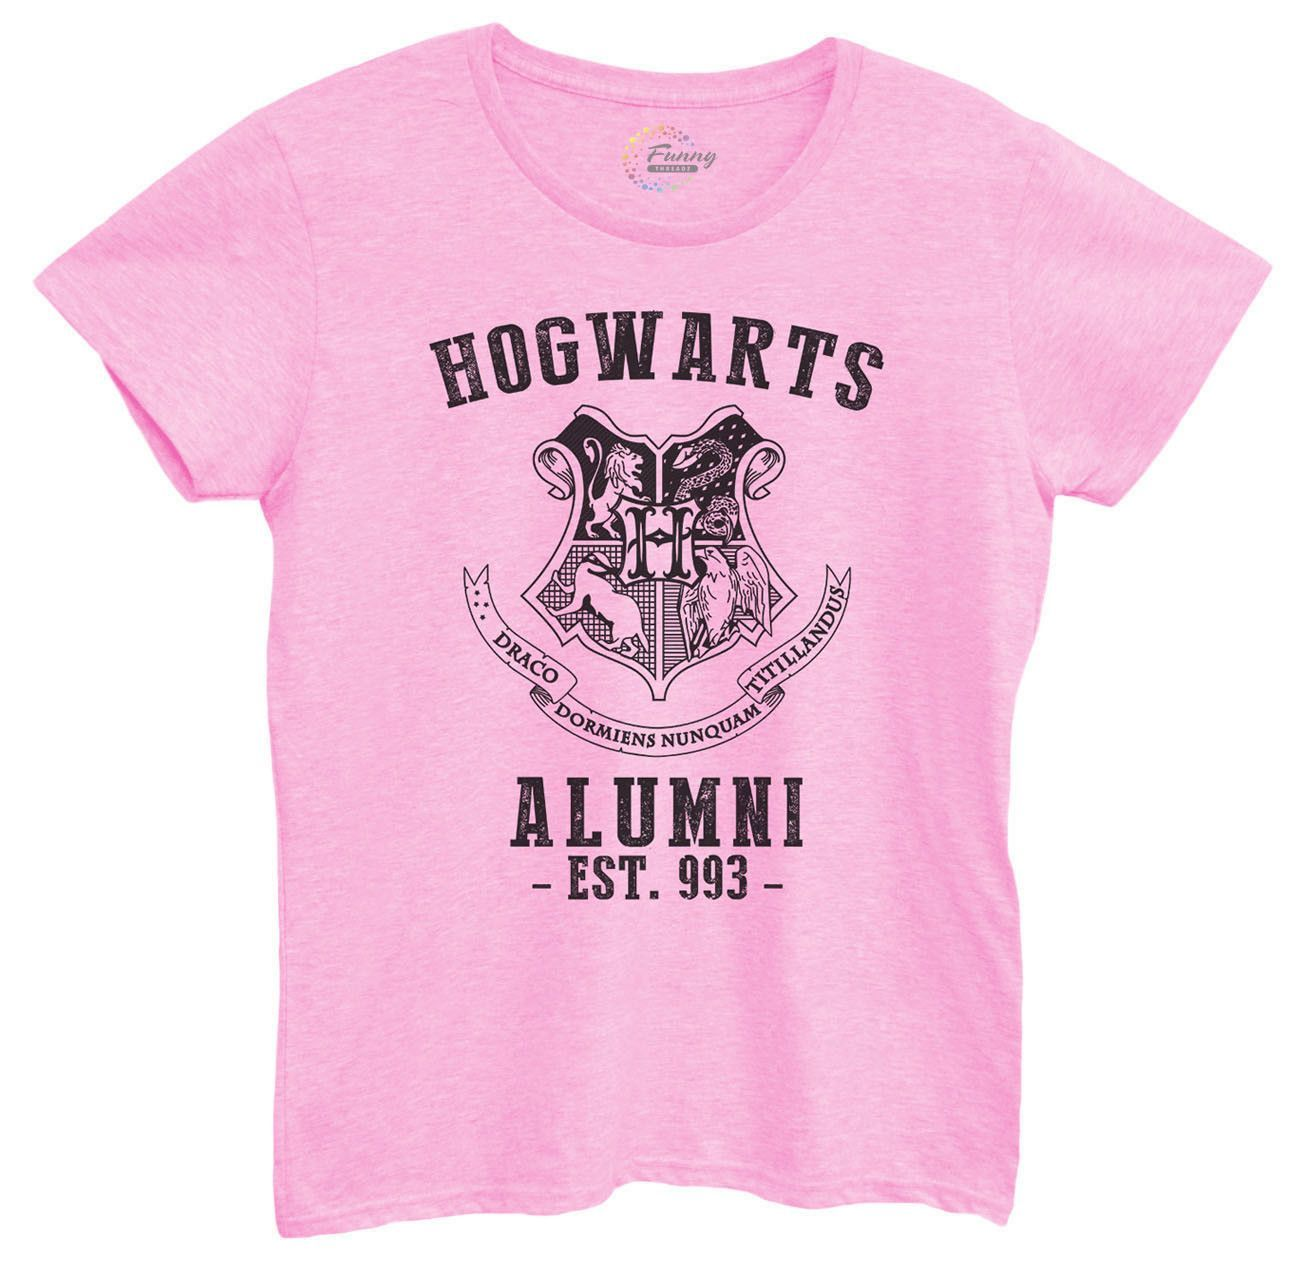 94d7ab88 Womens Hogwarts Alumni Tshirt | Products | Hogwarts alumni, T shirt ...